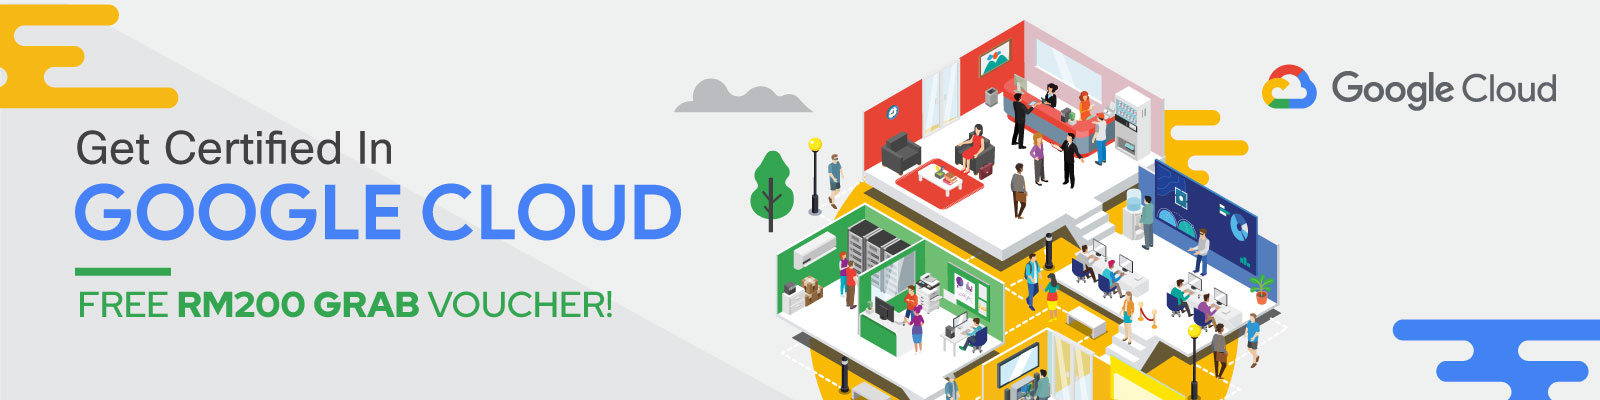 google-cloud-1600x400